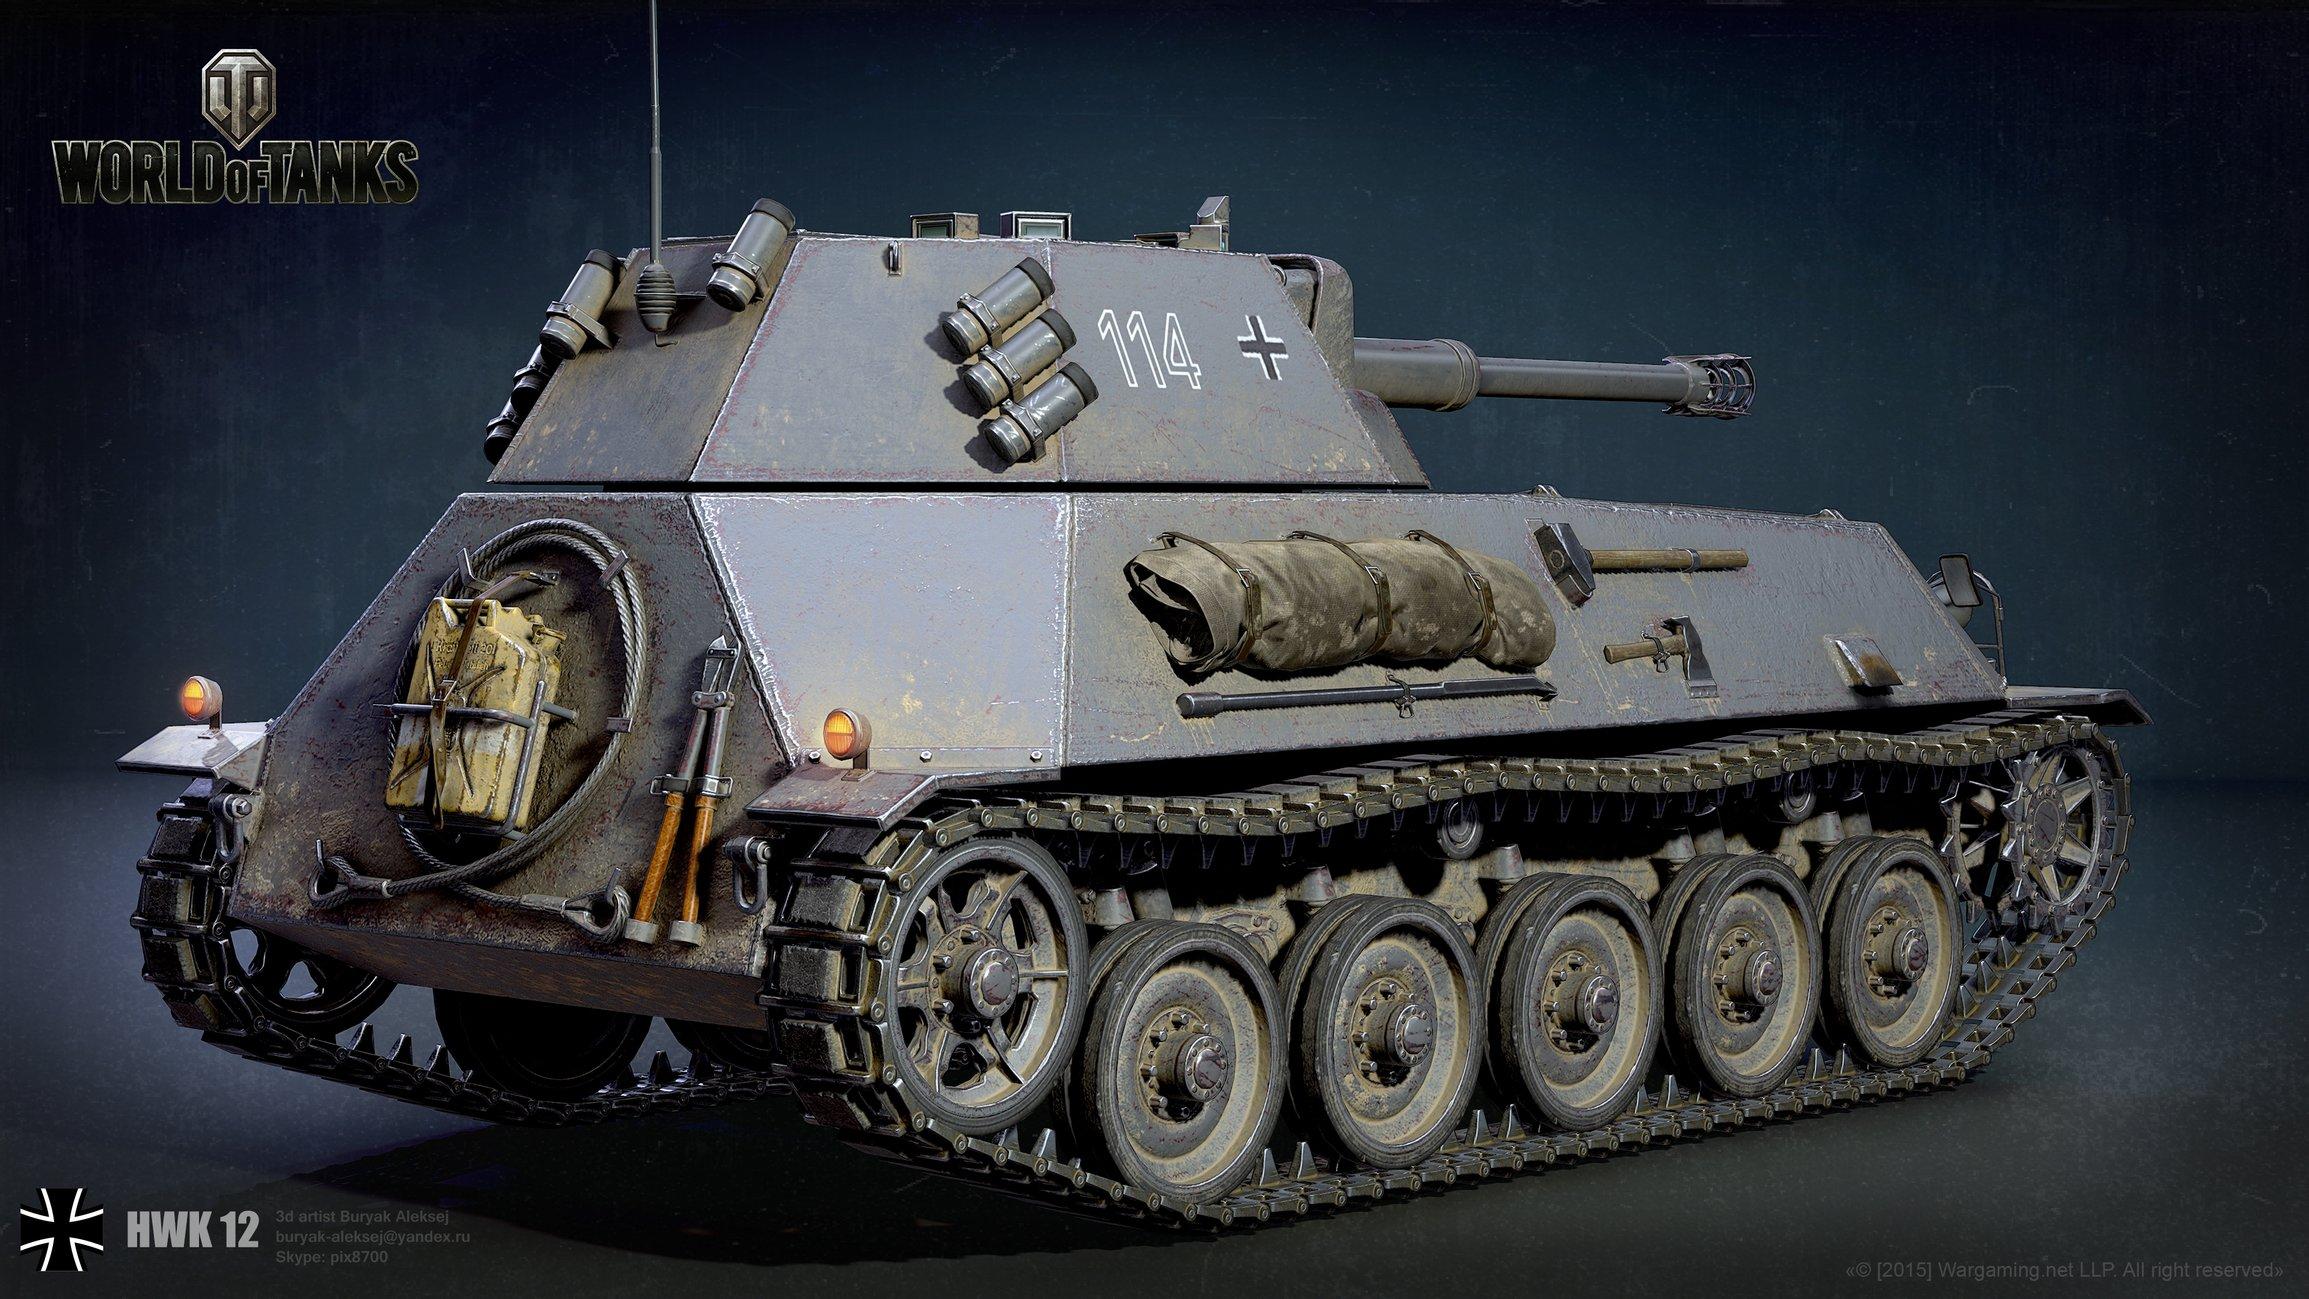 3d art showcase & critiques   reconstruction of the tank hwk 12